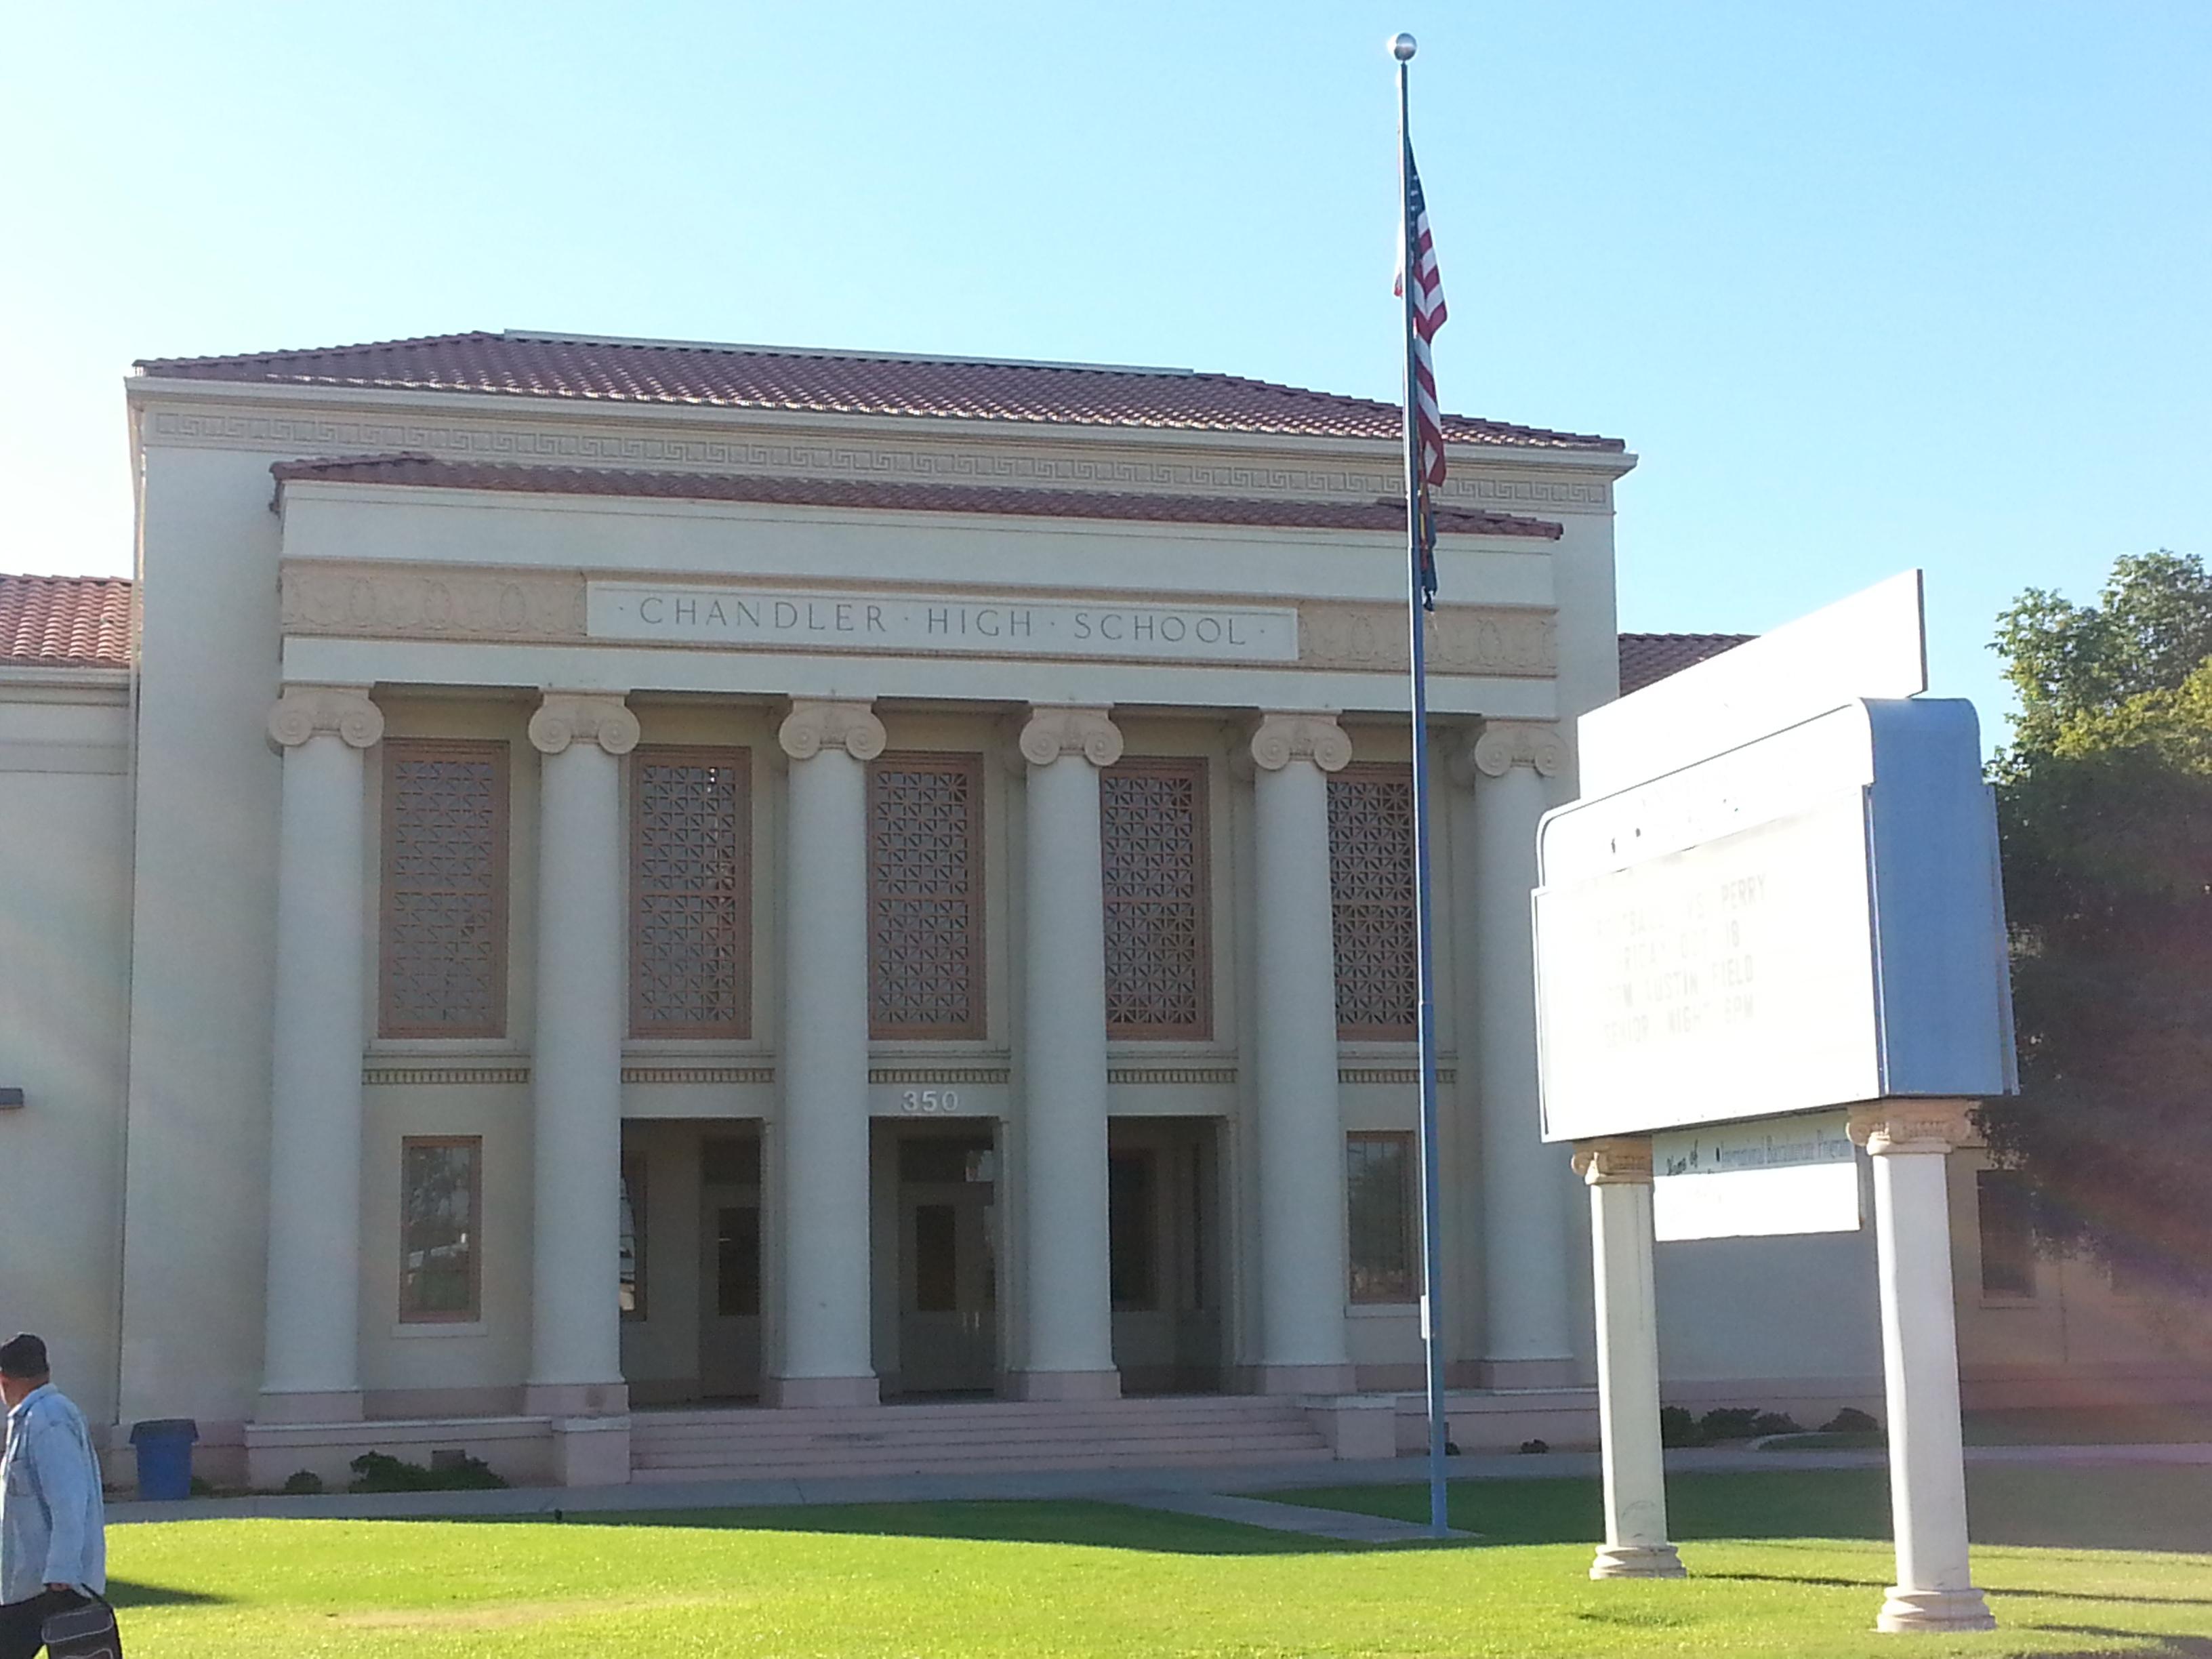 Chandler High School